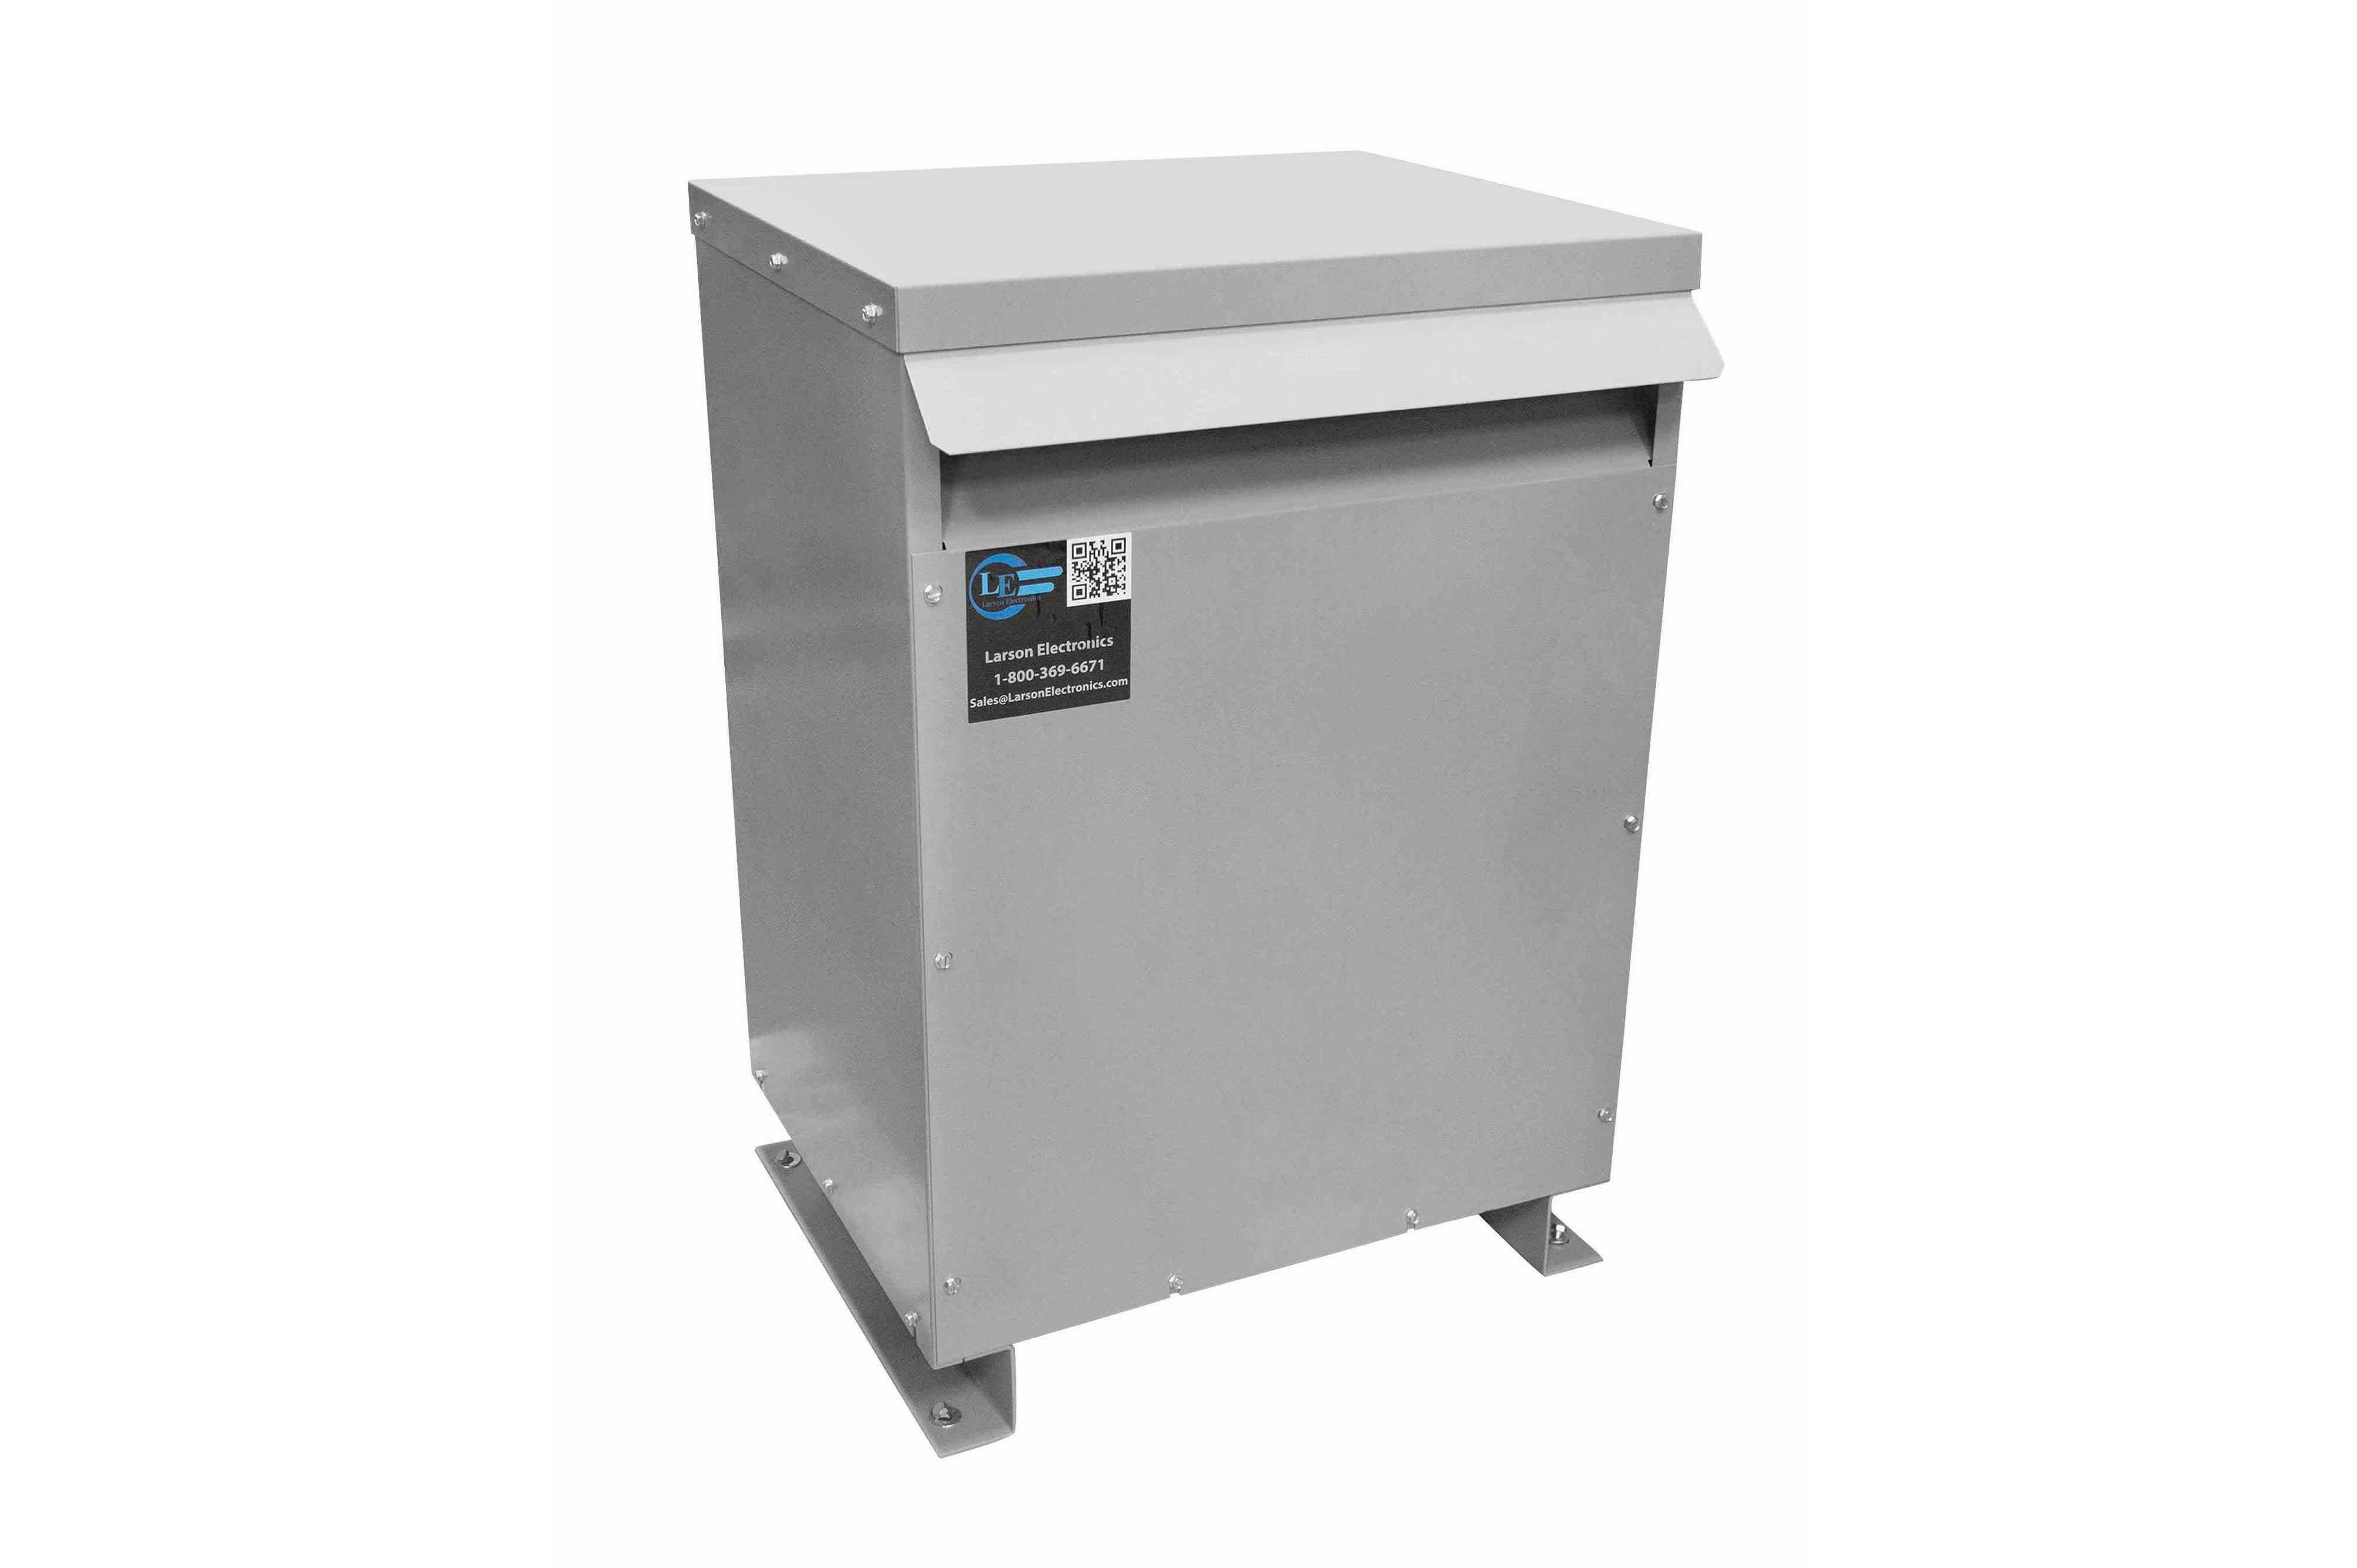 11 kVA 3PH Isolation Transformer, 380V Wye Primary, 208V Delta Secondary, N3R, Ventilated, 60 Hz